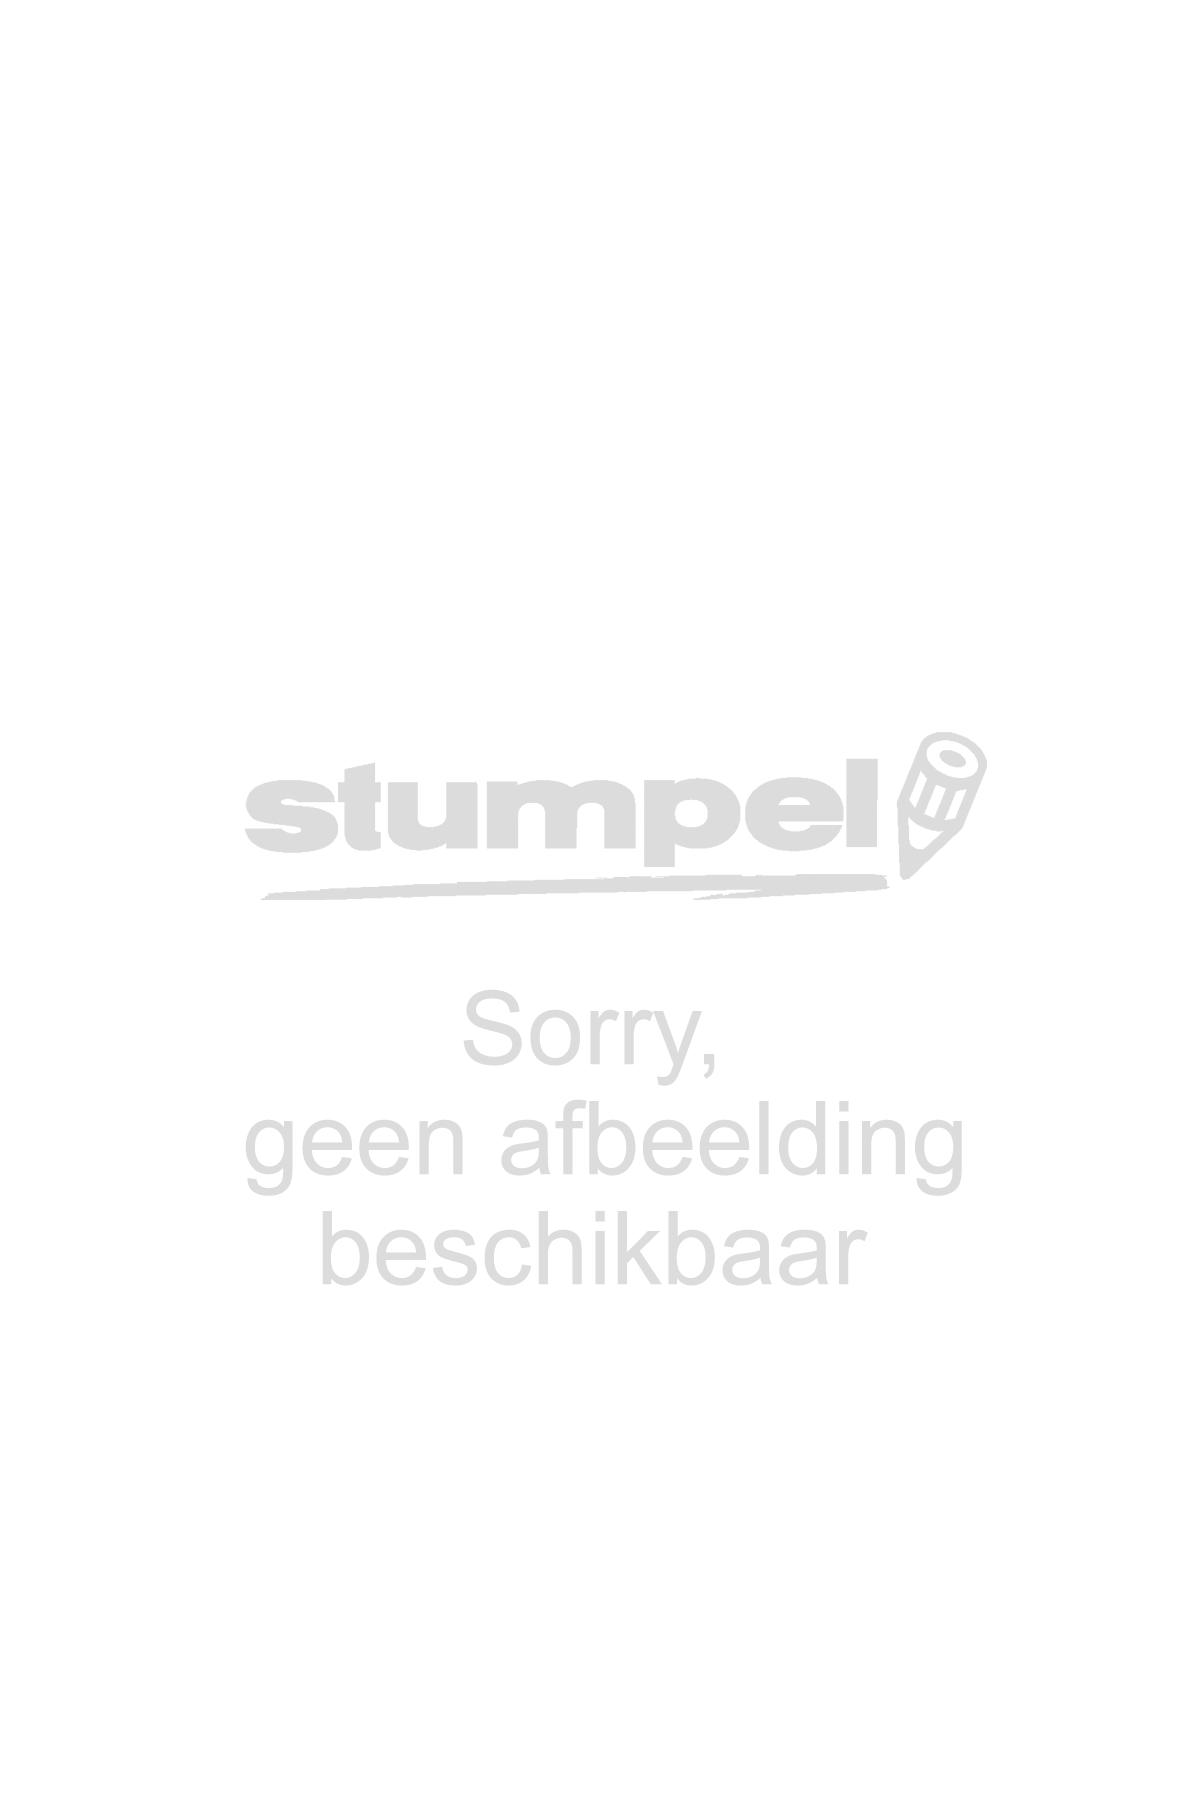 balpenvulling-schneider-7082-jumbo-parker-rood-625192